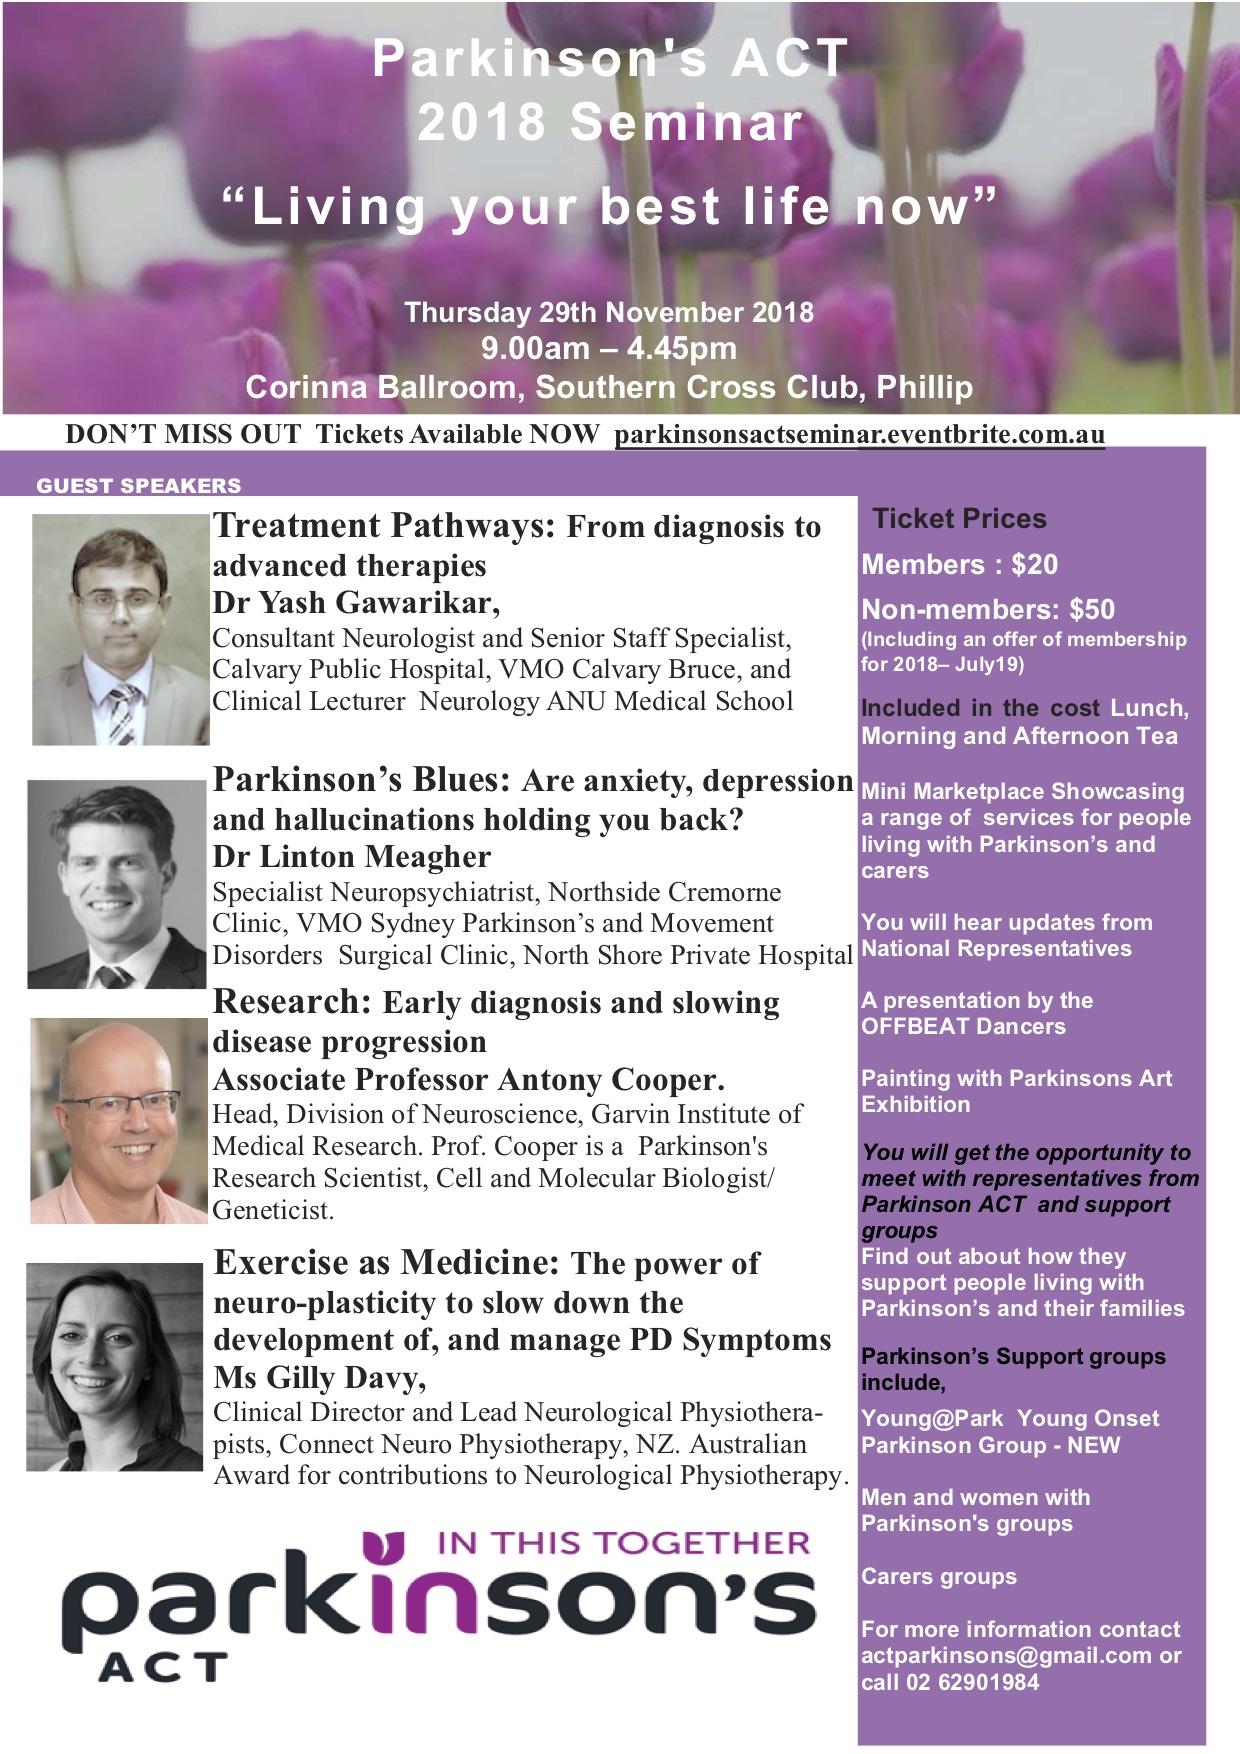 PACT Seminar Flyer